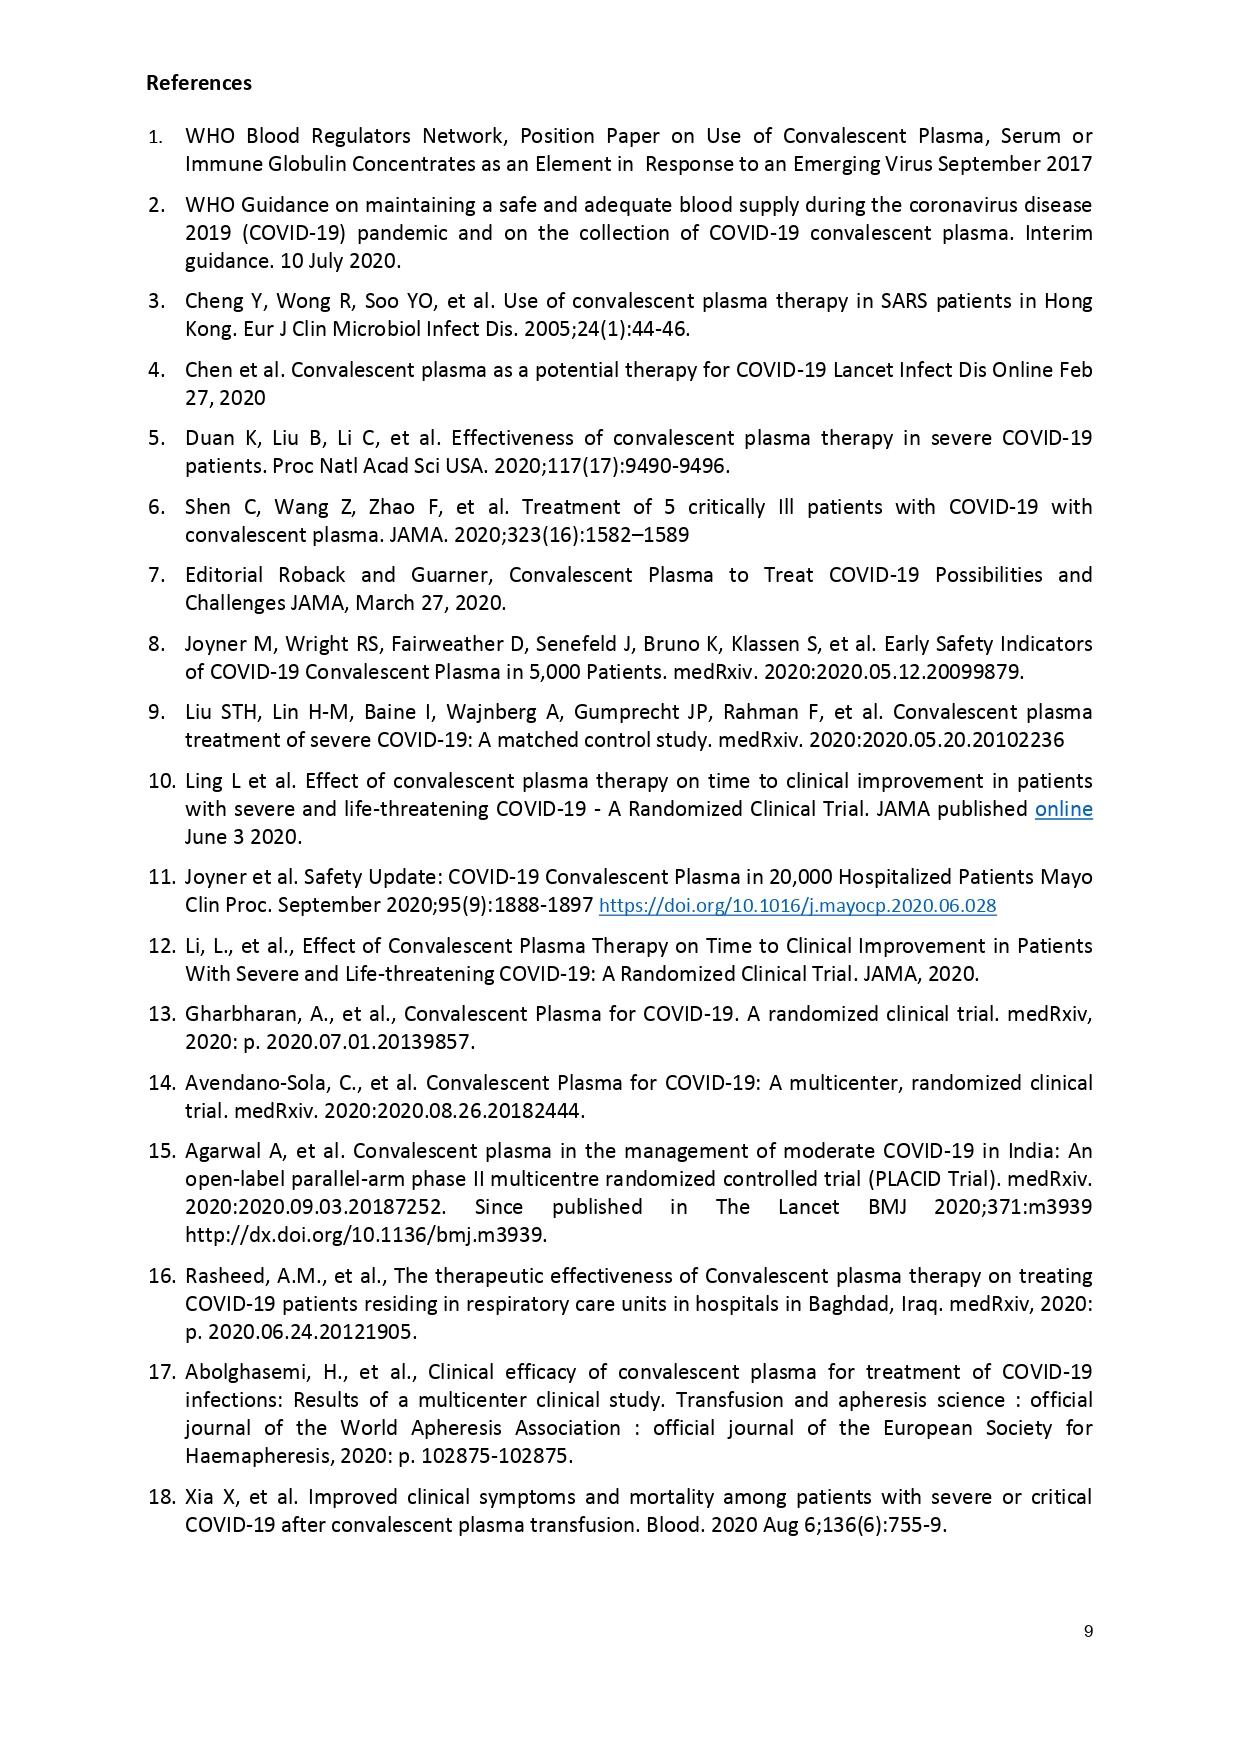 Guidance plasma Covid-19